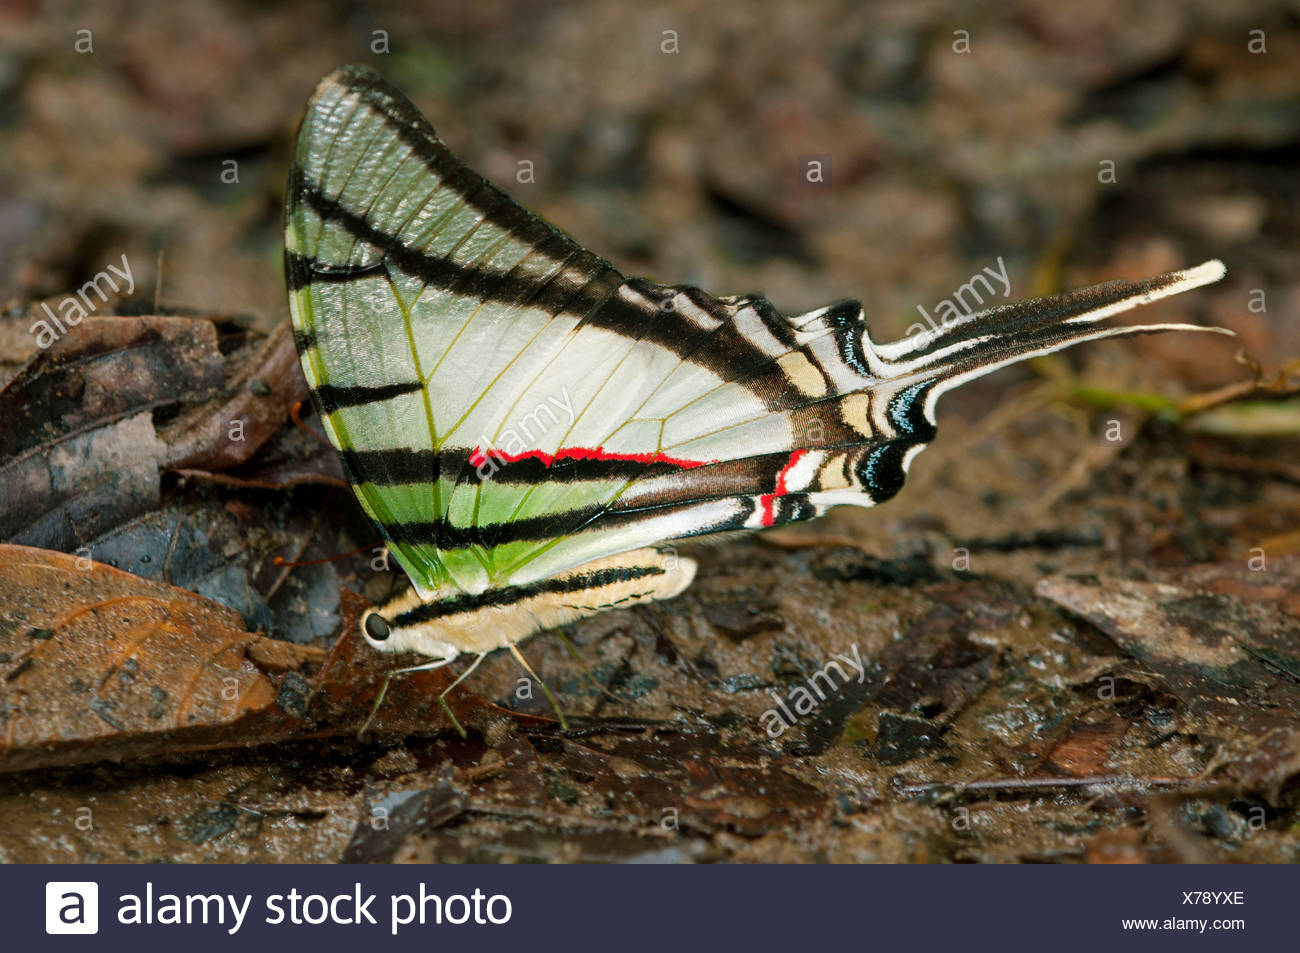 Zebra Swallowtail Butterfly (Euritides protesilanus, Papilionidae), Tiputini rain forest, Yasuni National Park, Ecuador - Stock Image